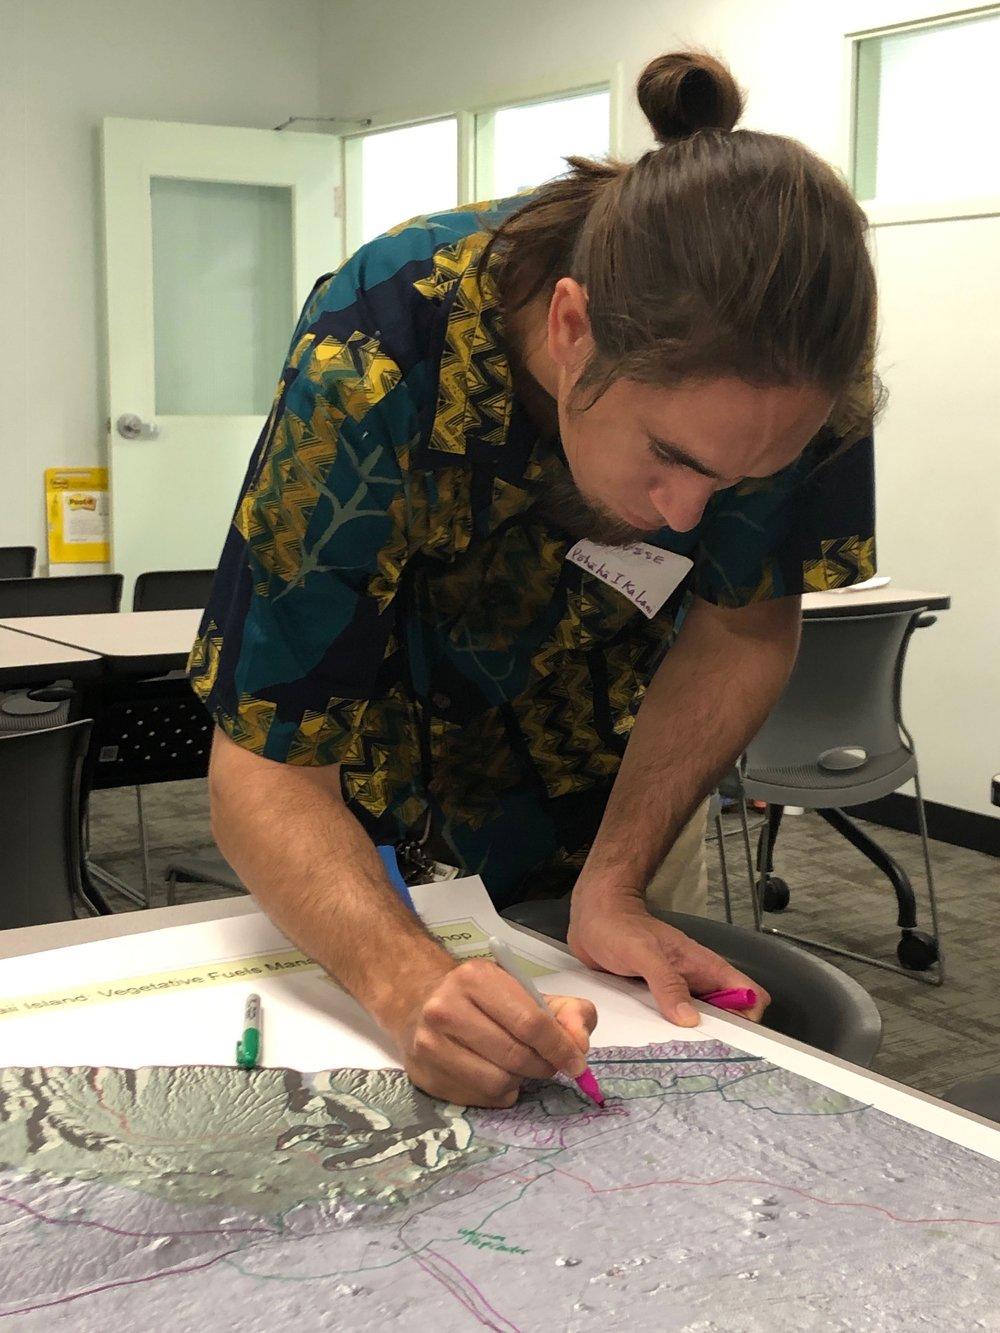 Hawaii Island Hilo Vegetative Fuels Management Collaborative Action Planning Workshop_2_22_2019_10.jpg